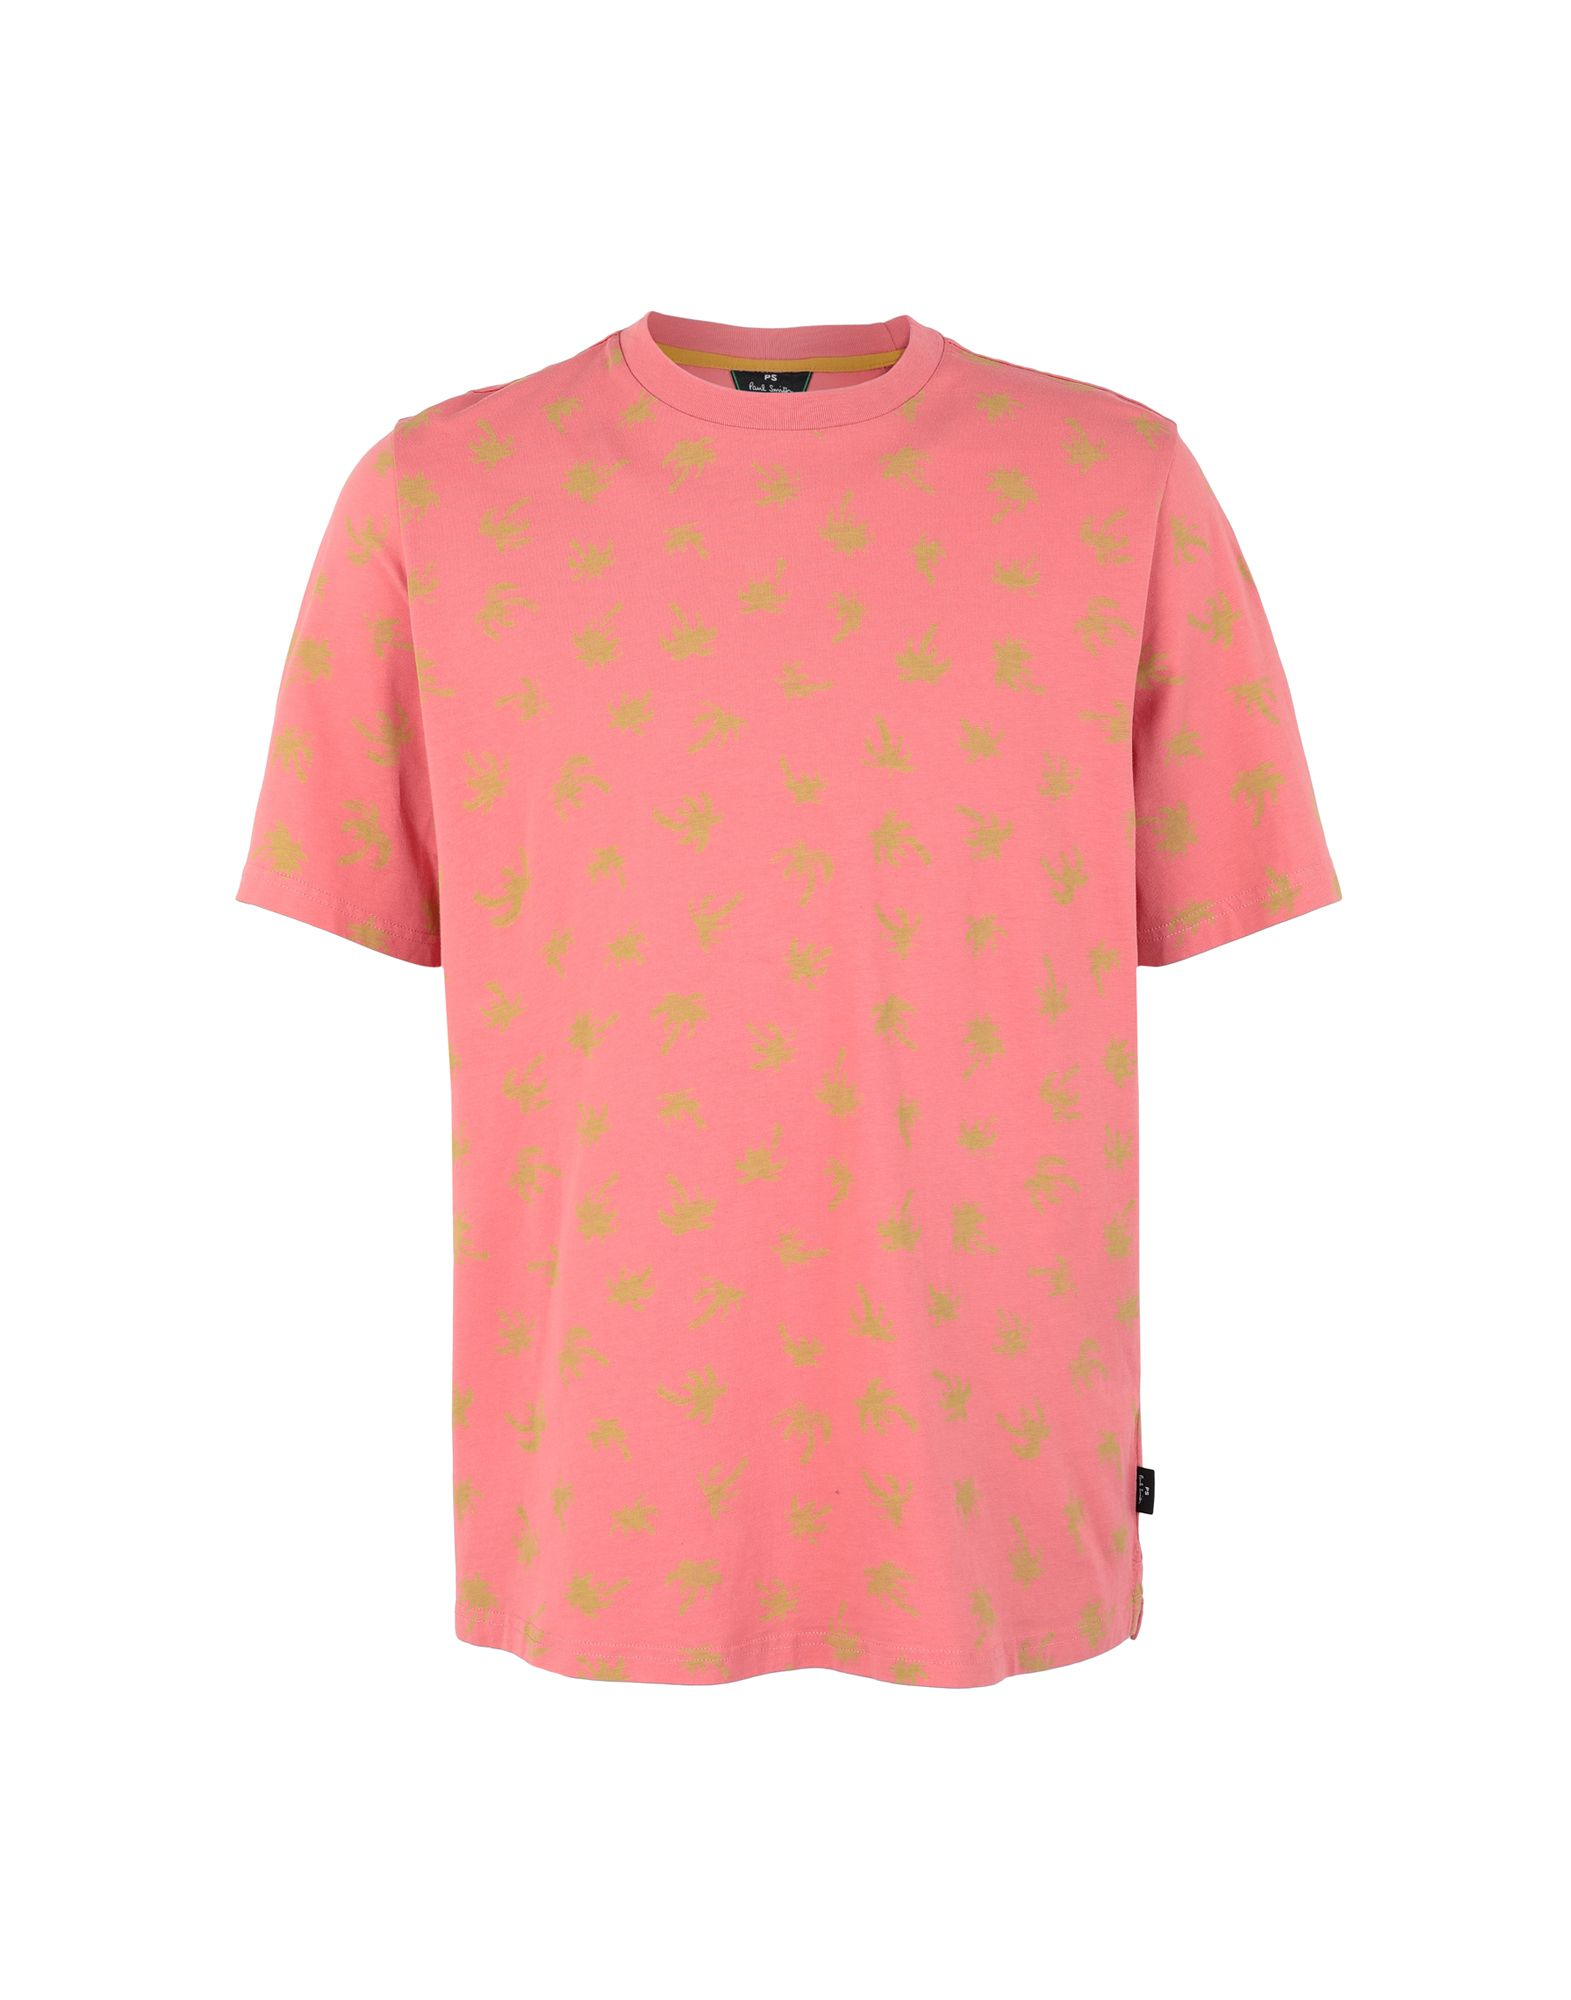 T-Shirt Ps Paul Smith uomo - 12311700VP 12311700VP 12311700VP 023